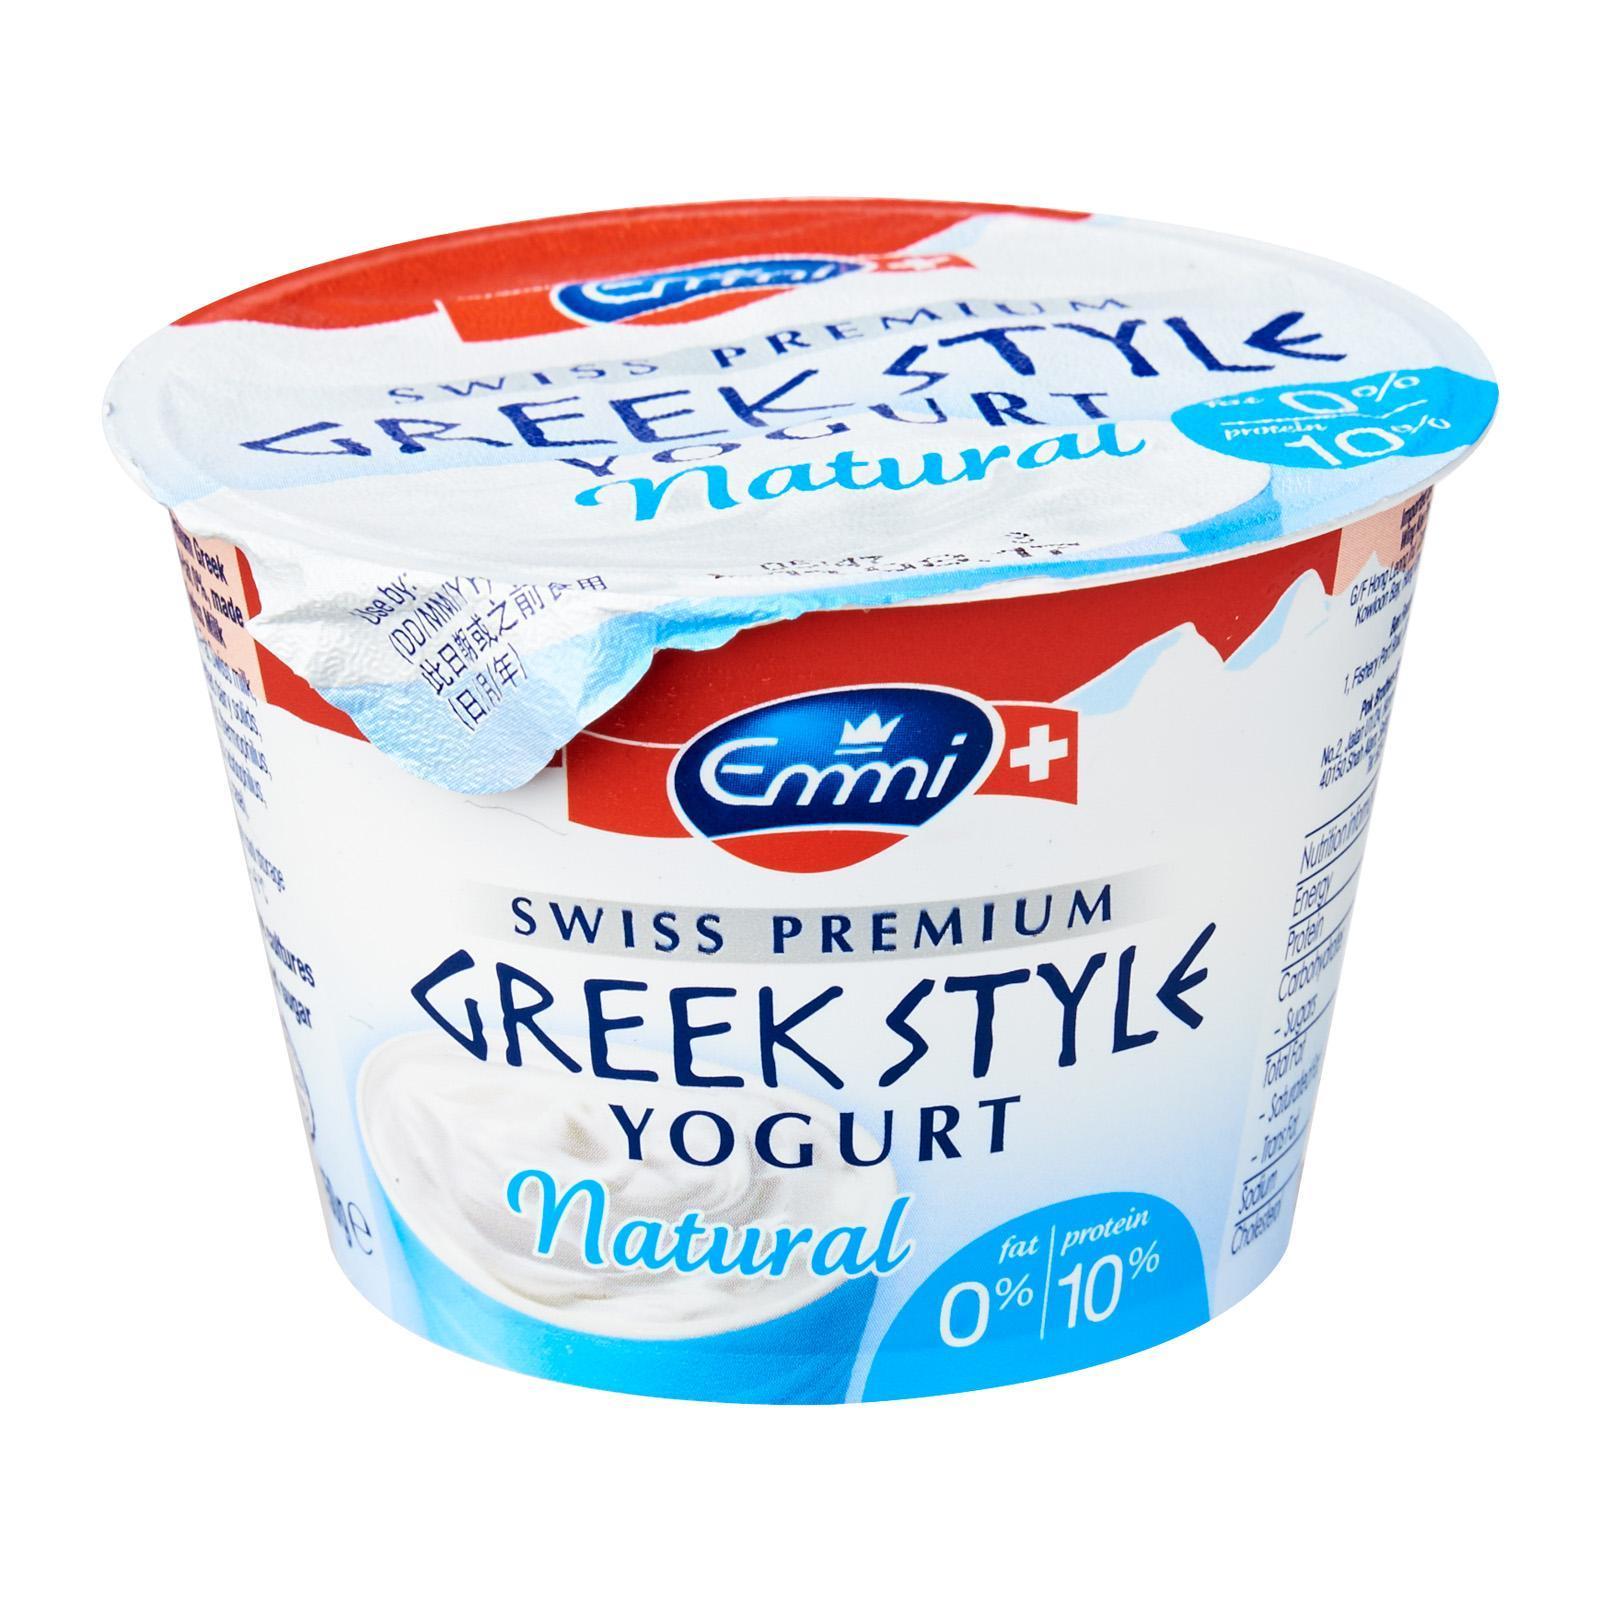 Emmi Swiss Greek Style Natural Yoghurt 0%